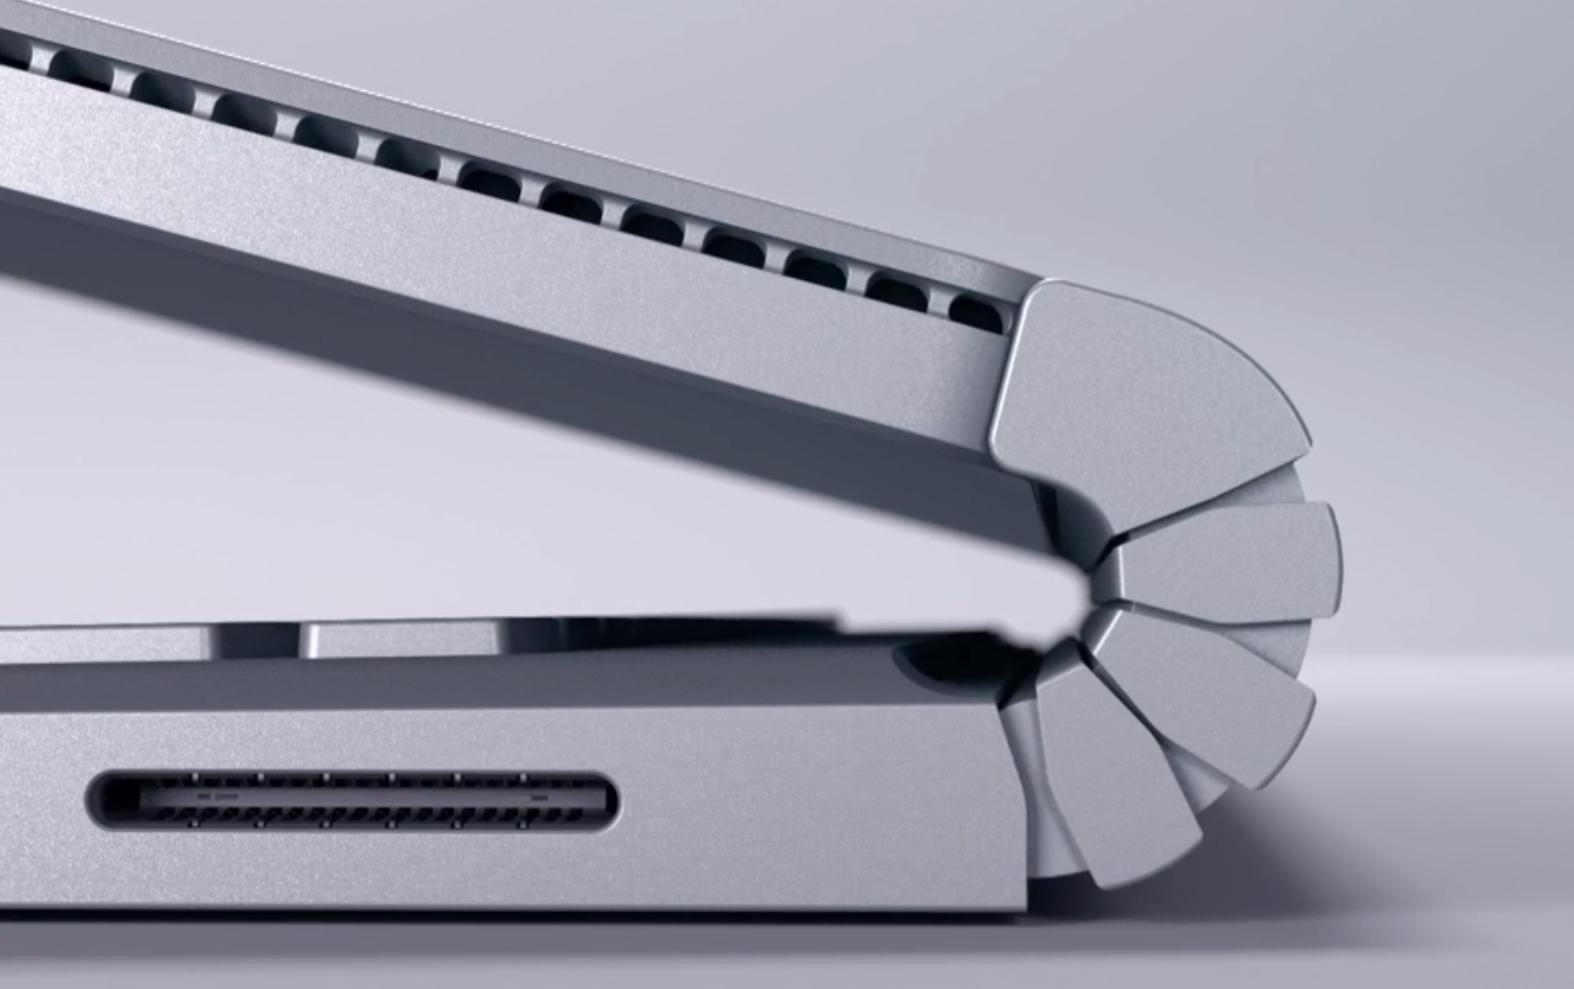 Ноутбук APPLE MacBook Pro 15 Space Grey MPTT2RU/A (Intel Core i7 2.9 GHz/16384Mb/512Gb/Radeon Pro 560 4096Mb/Intel HD Graphics 630/Wi-Fi/Bluetooth/Cam/15.4/2880x1800/macOS Sierra)